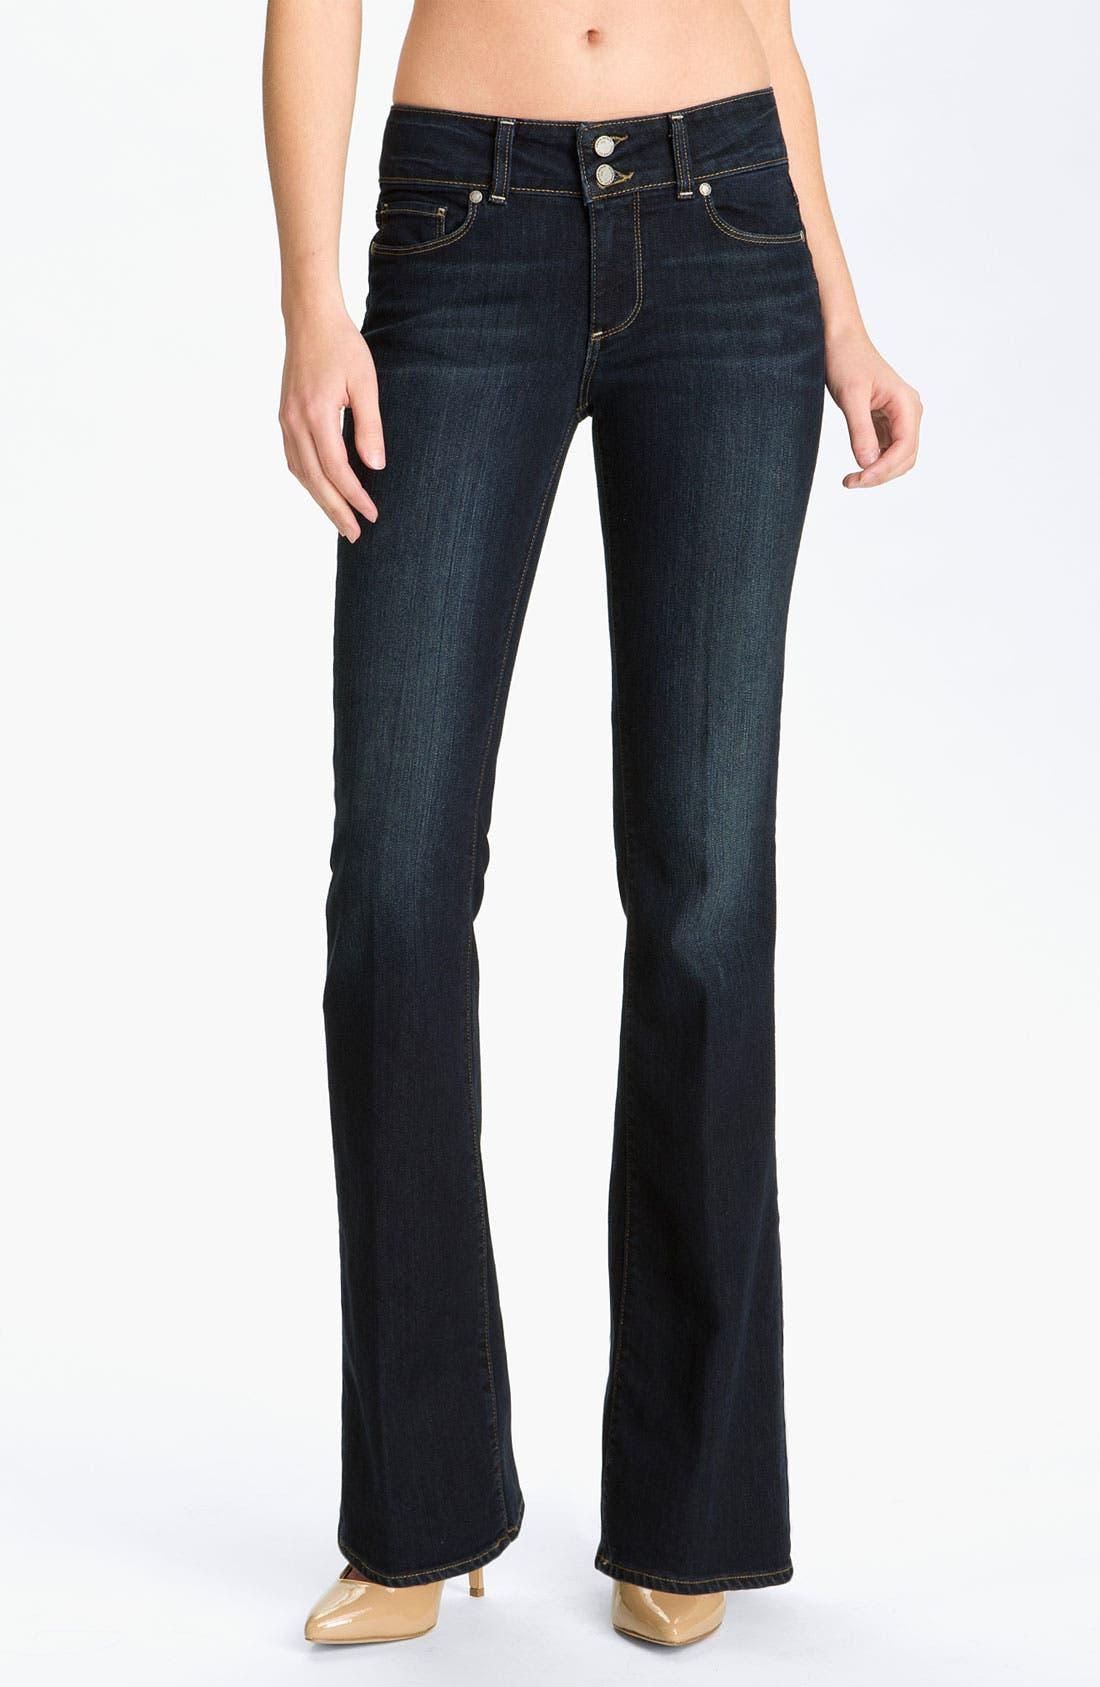 Alternate Image 1 Selected - Paige Denim 'Hidden Hills' Bootcut Stretch Jeans (Super McKinley)